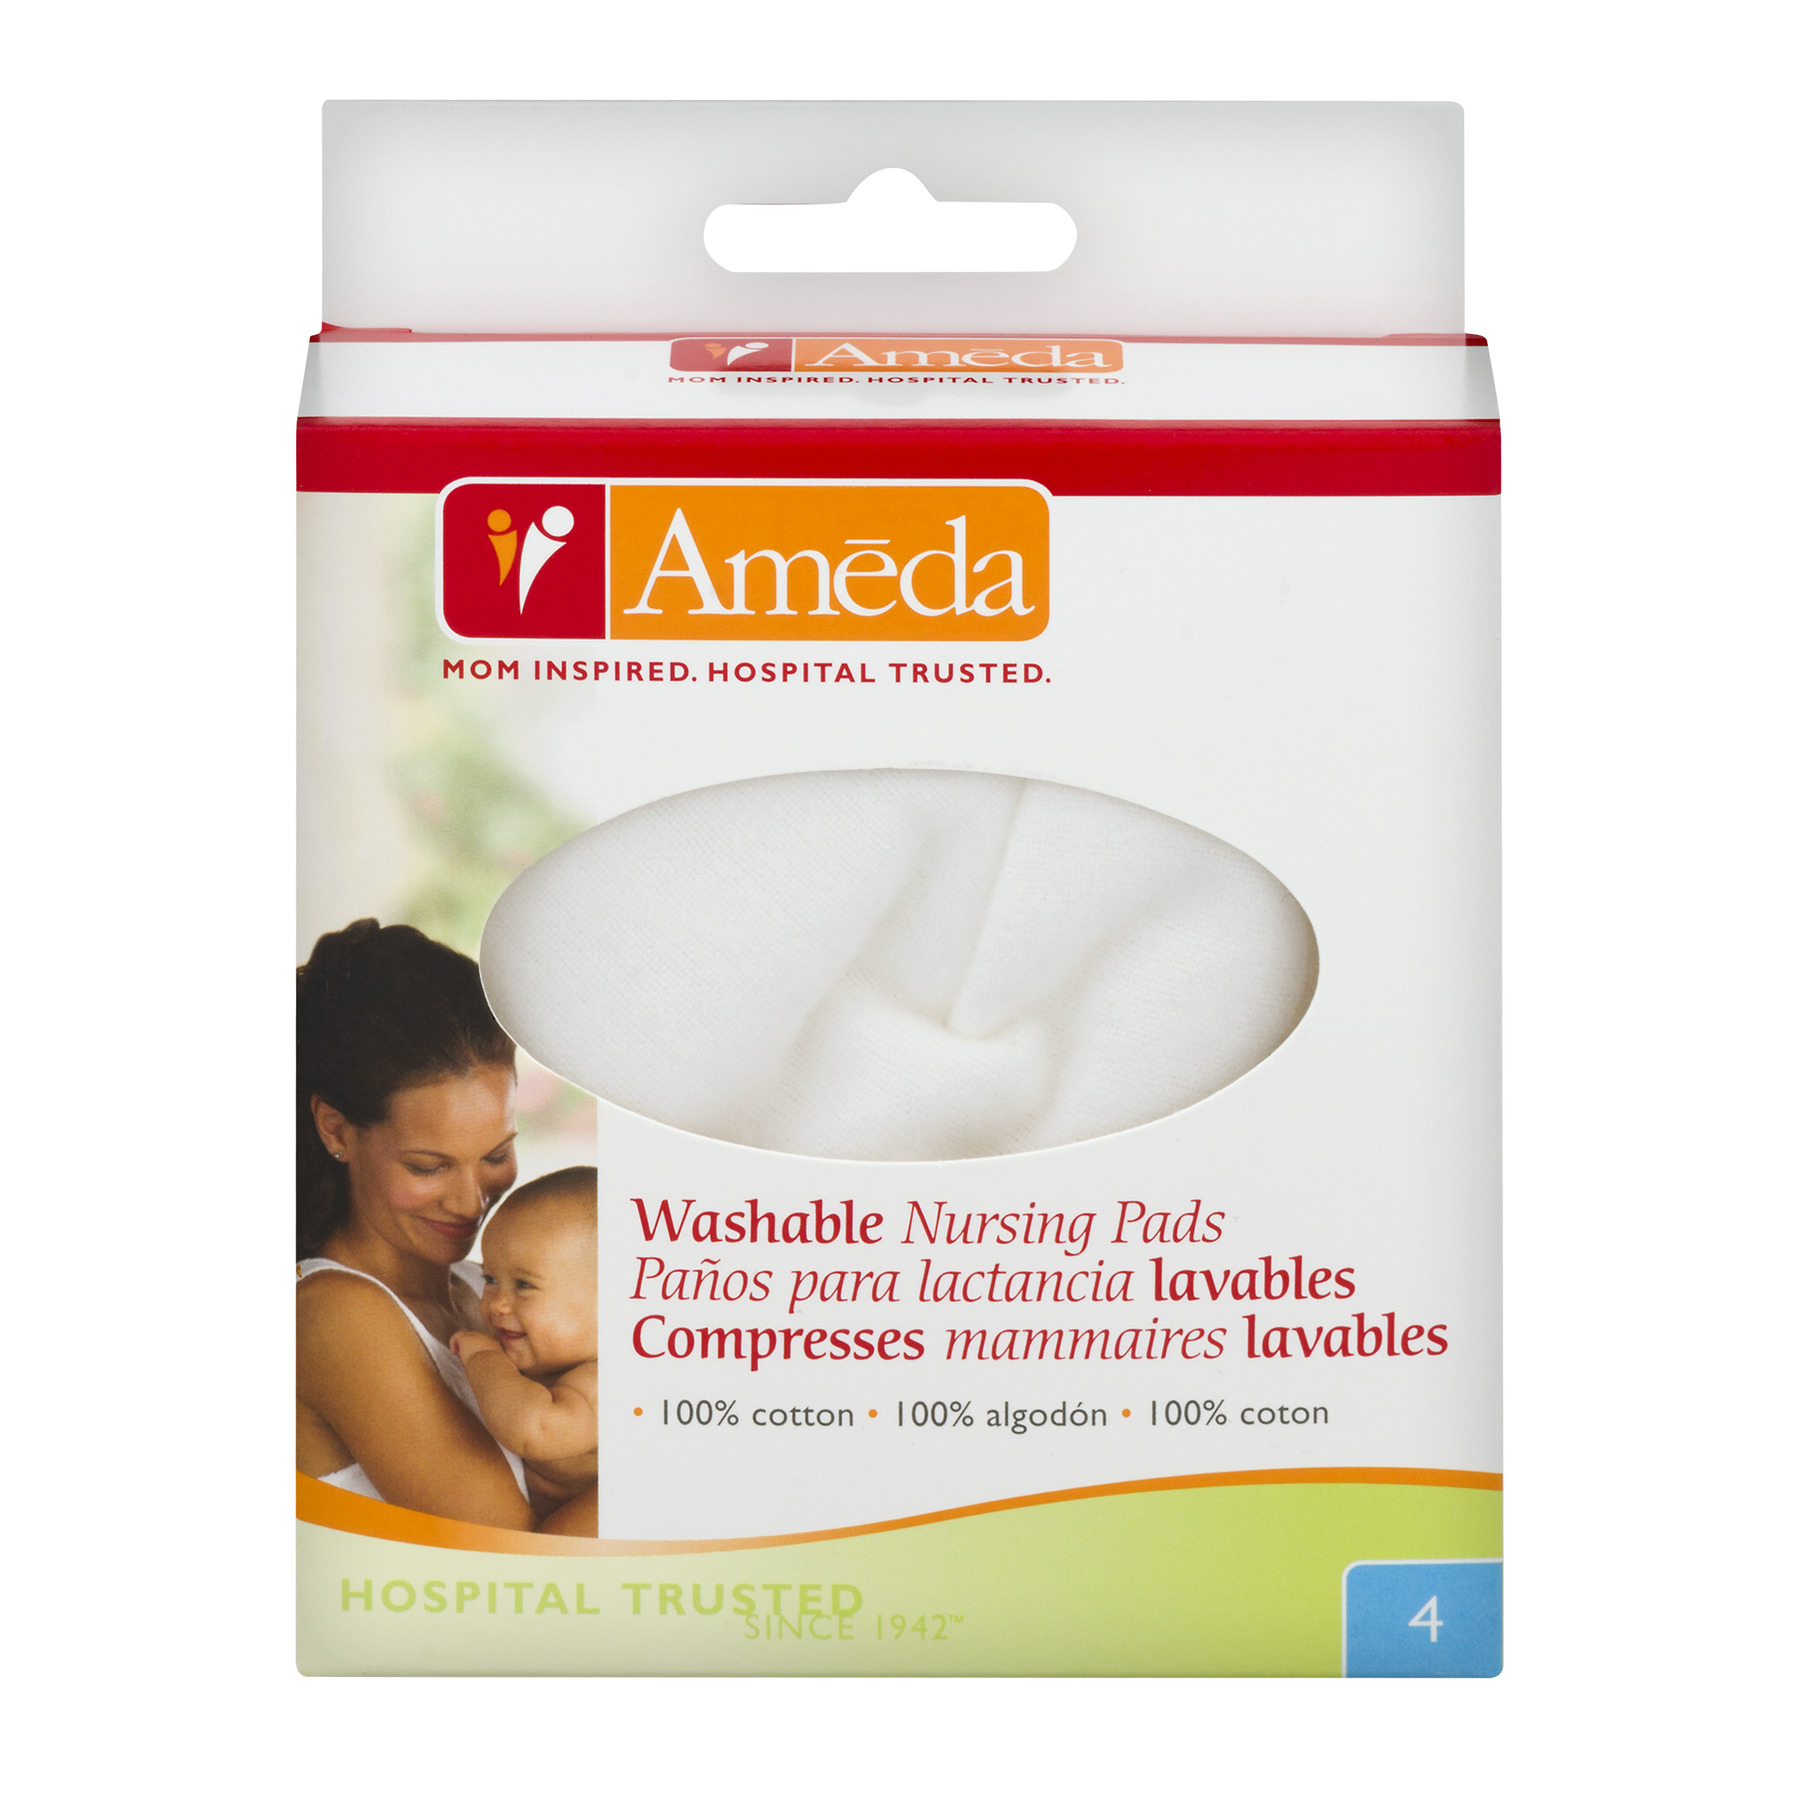 Ameda Washable Nursing Pads 4 CT4.0 CT by Ameda